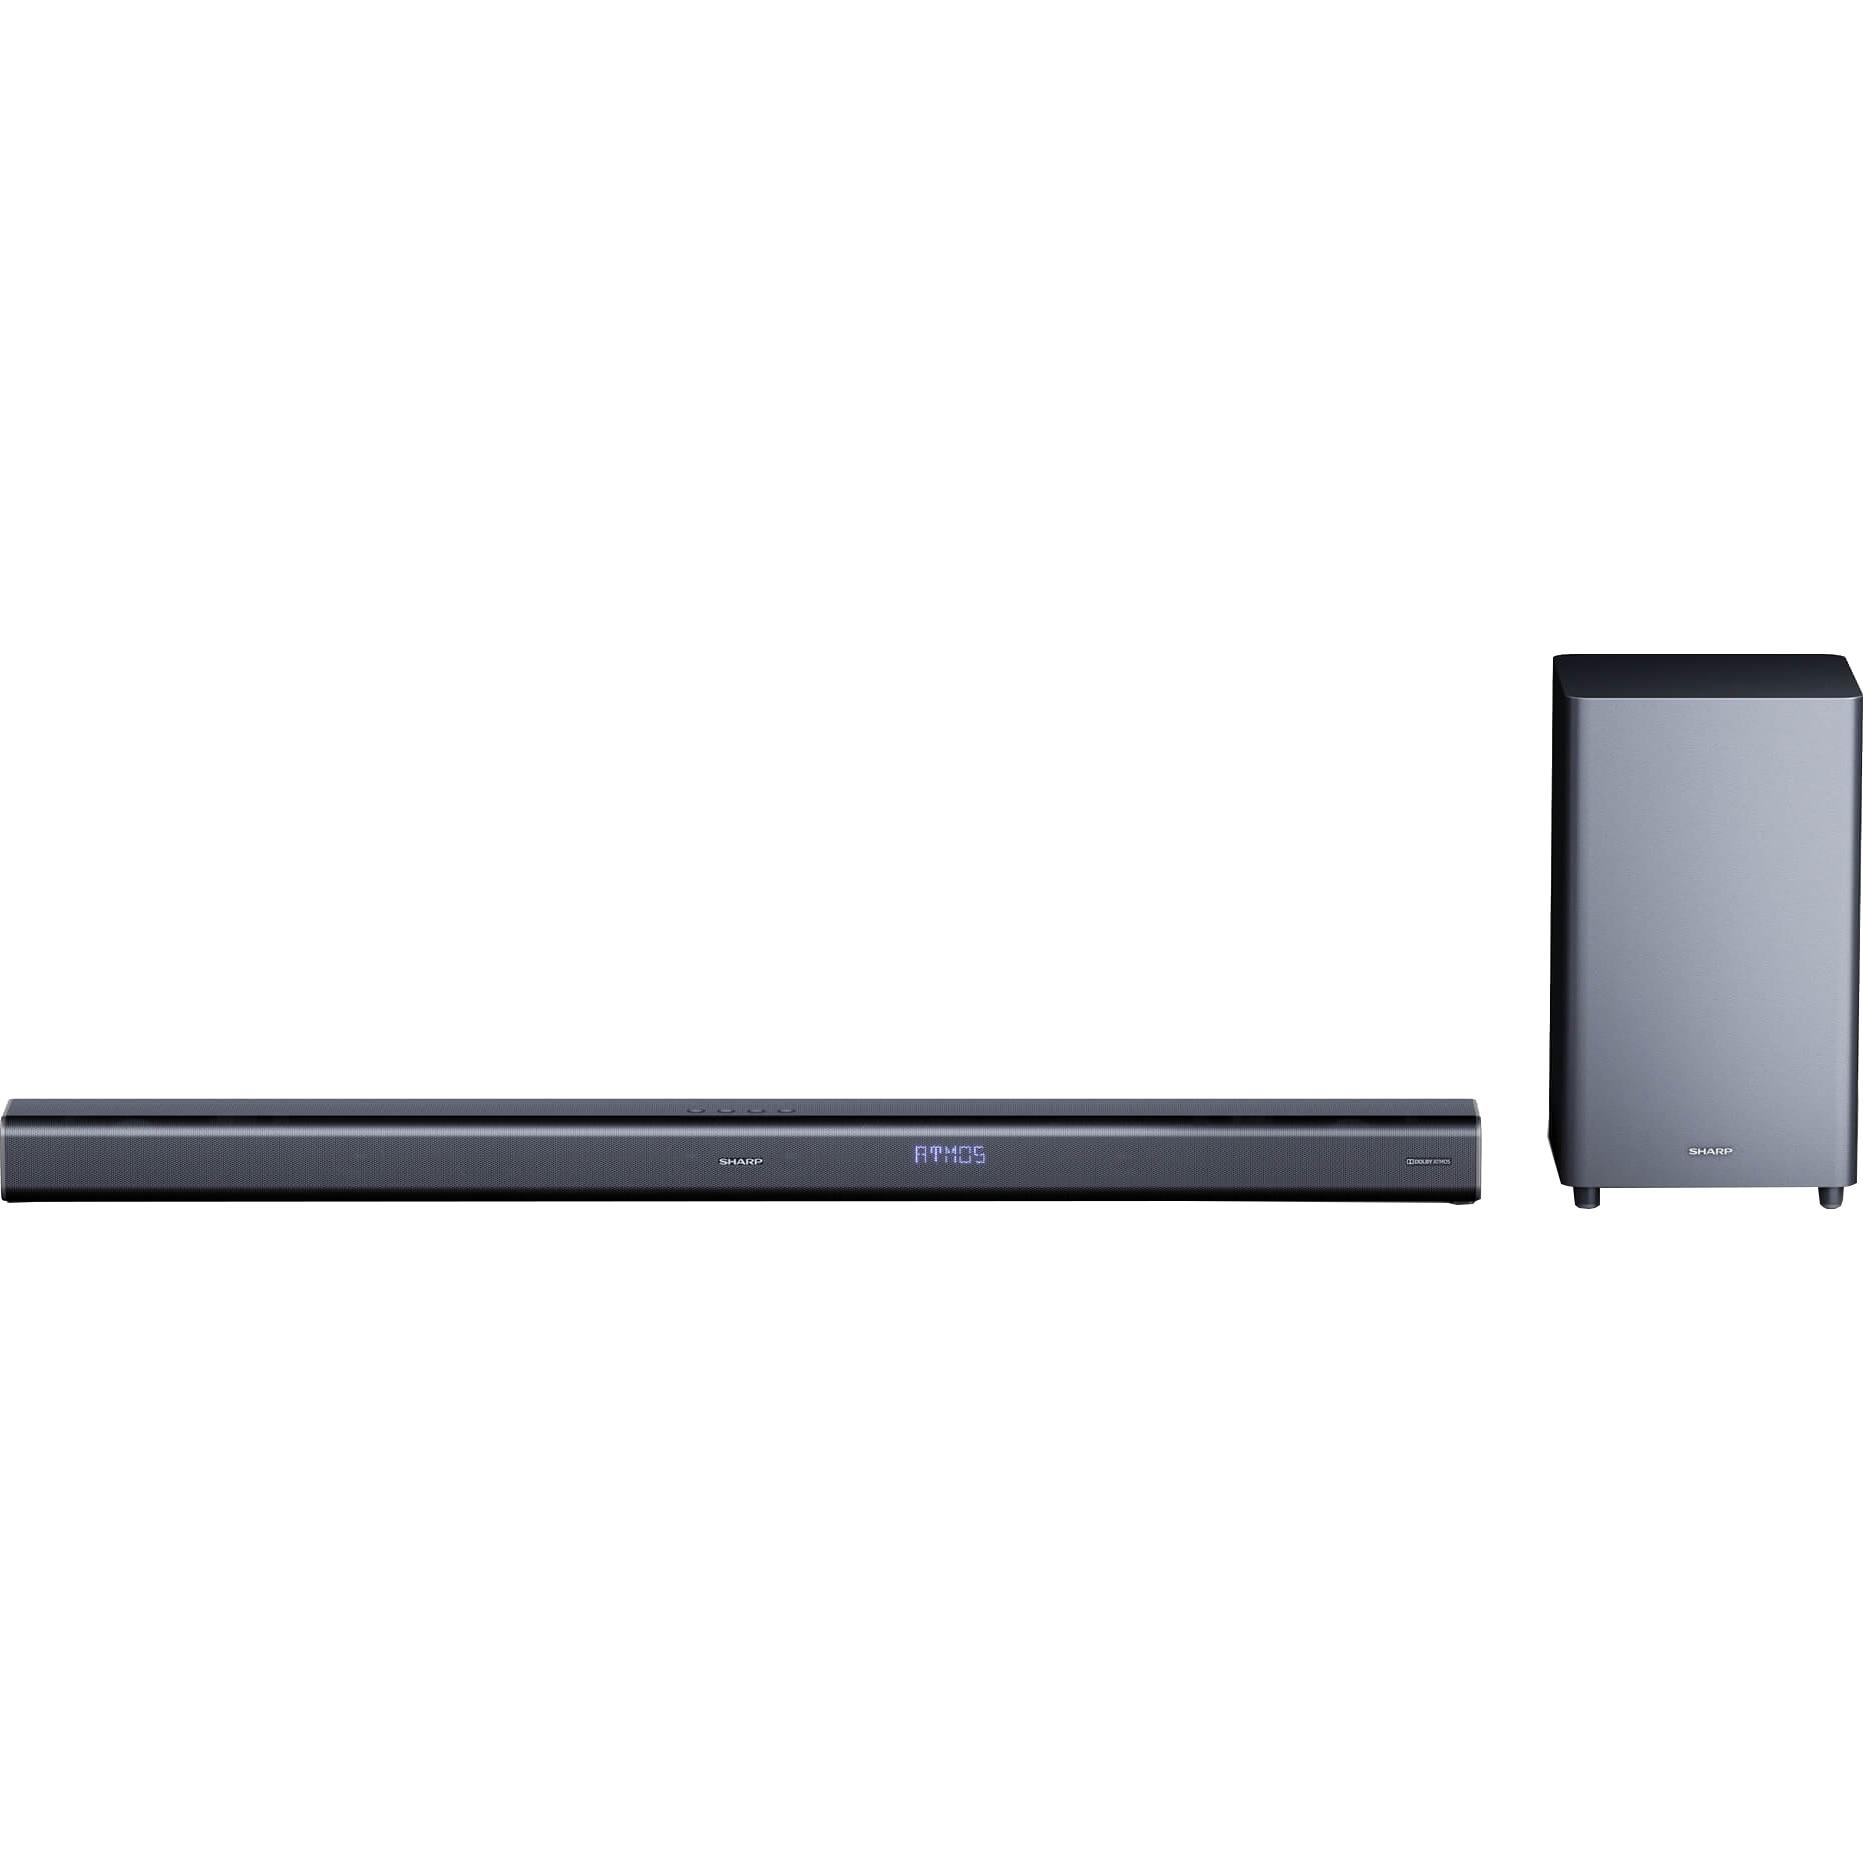 Fotografie Soundbar Sharp HT-SBW800, 5.1.2, Dolby Atmos, 570W, 4K, 3D Surround Sound, Subwoofer wireless, Bluetooth, Negru